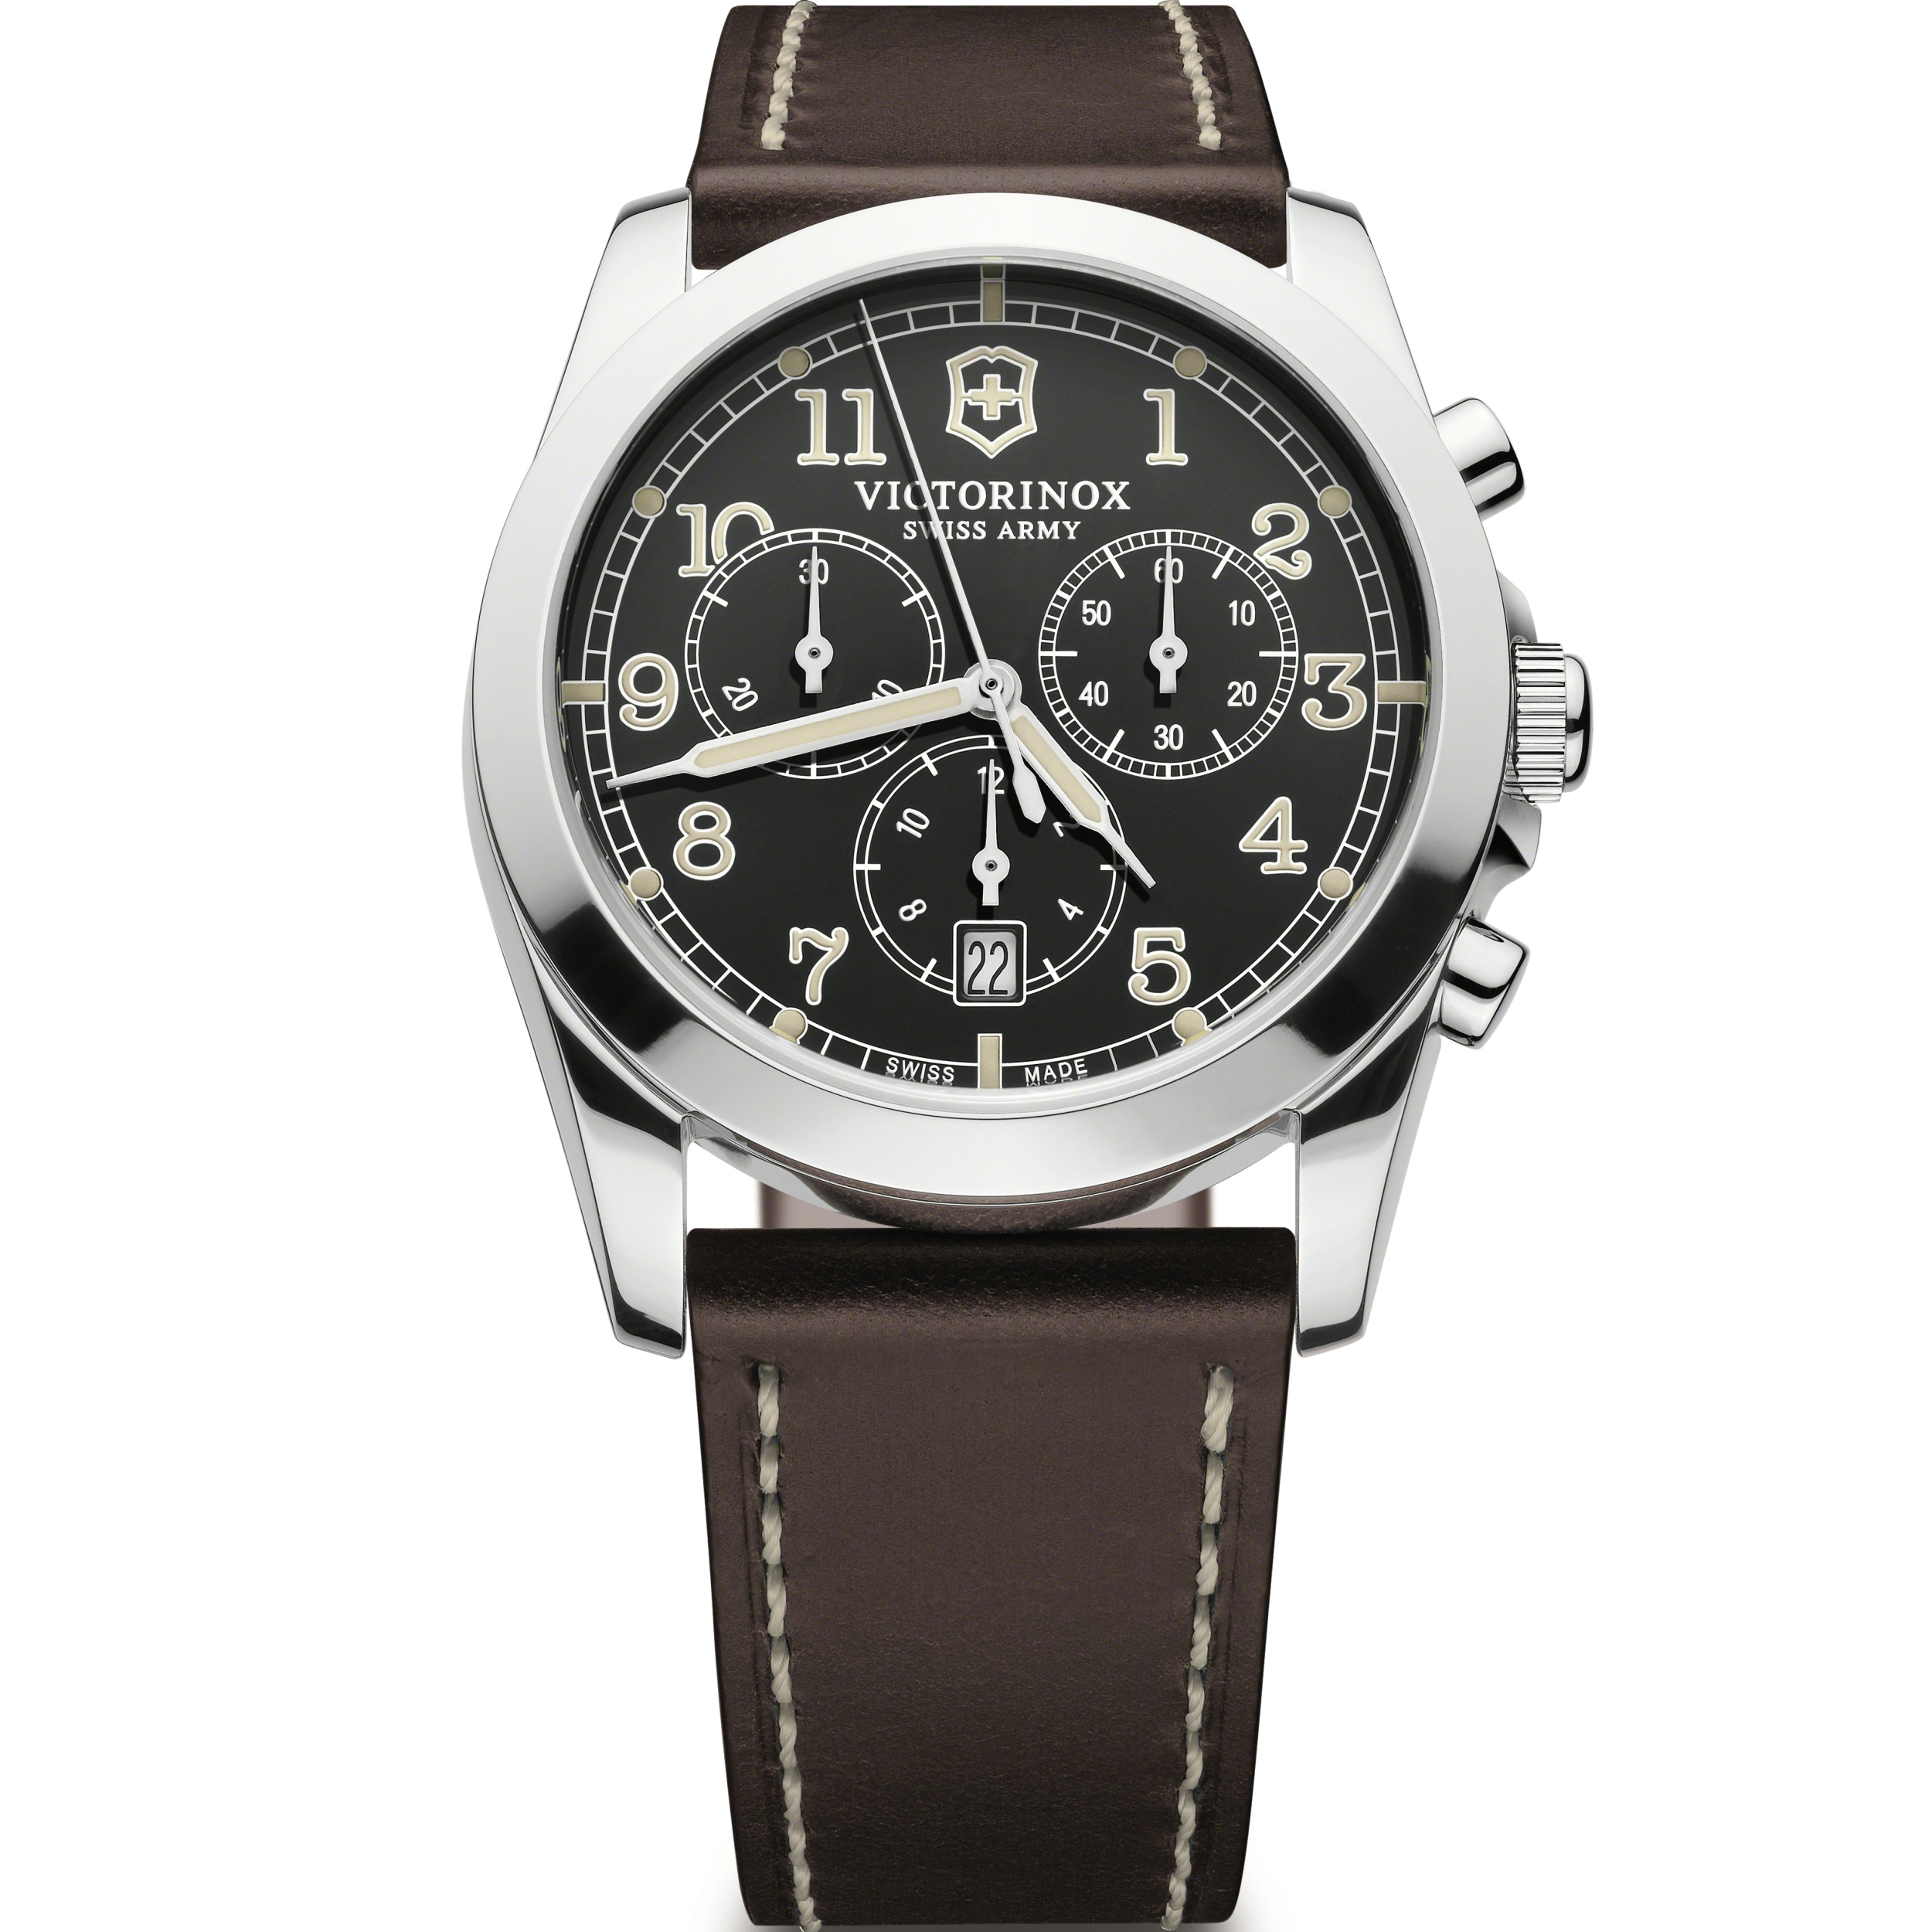 Gents Victorinox Swiss Army Infantry Chronograph Watch (241567 ... 8798ac40cd